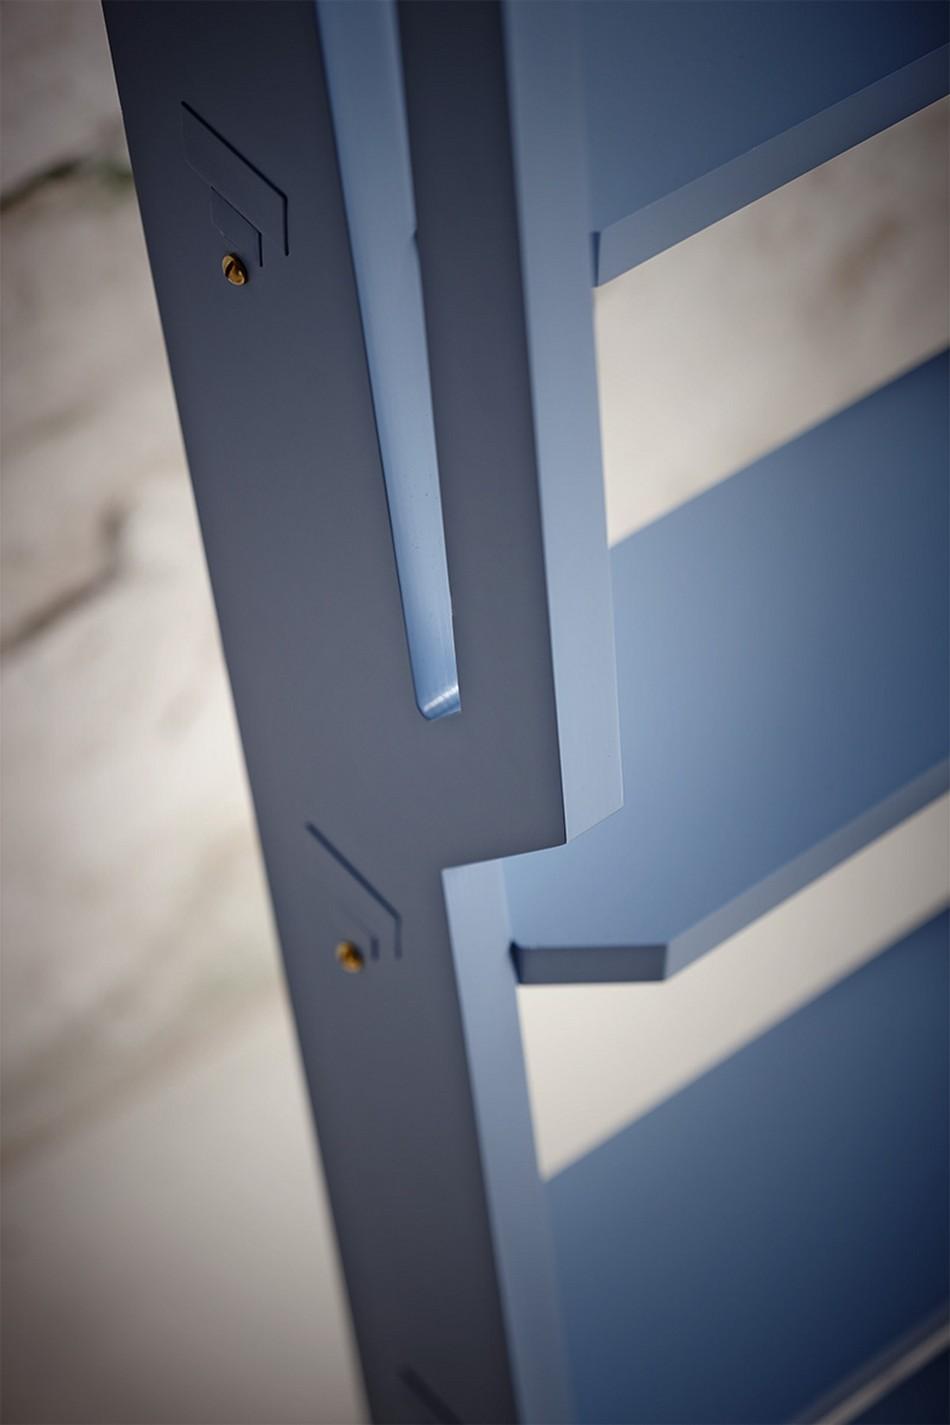 Mavi Kitaplık Merdiveni